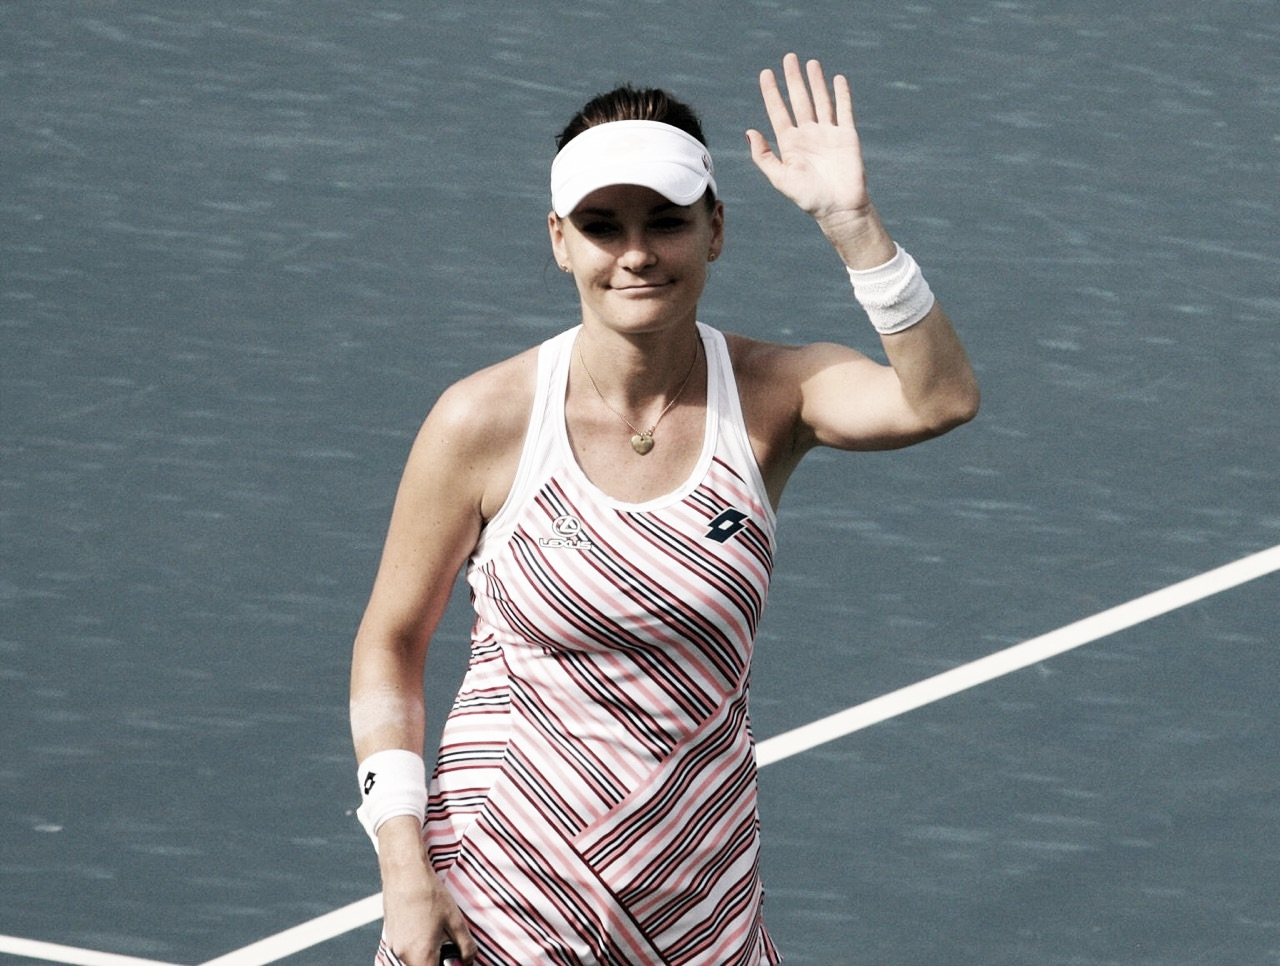 Adeus, ninja: Radwanska anuncia aposentadoria por conta de problemas físicos